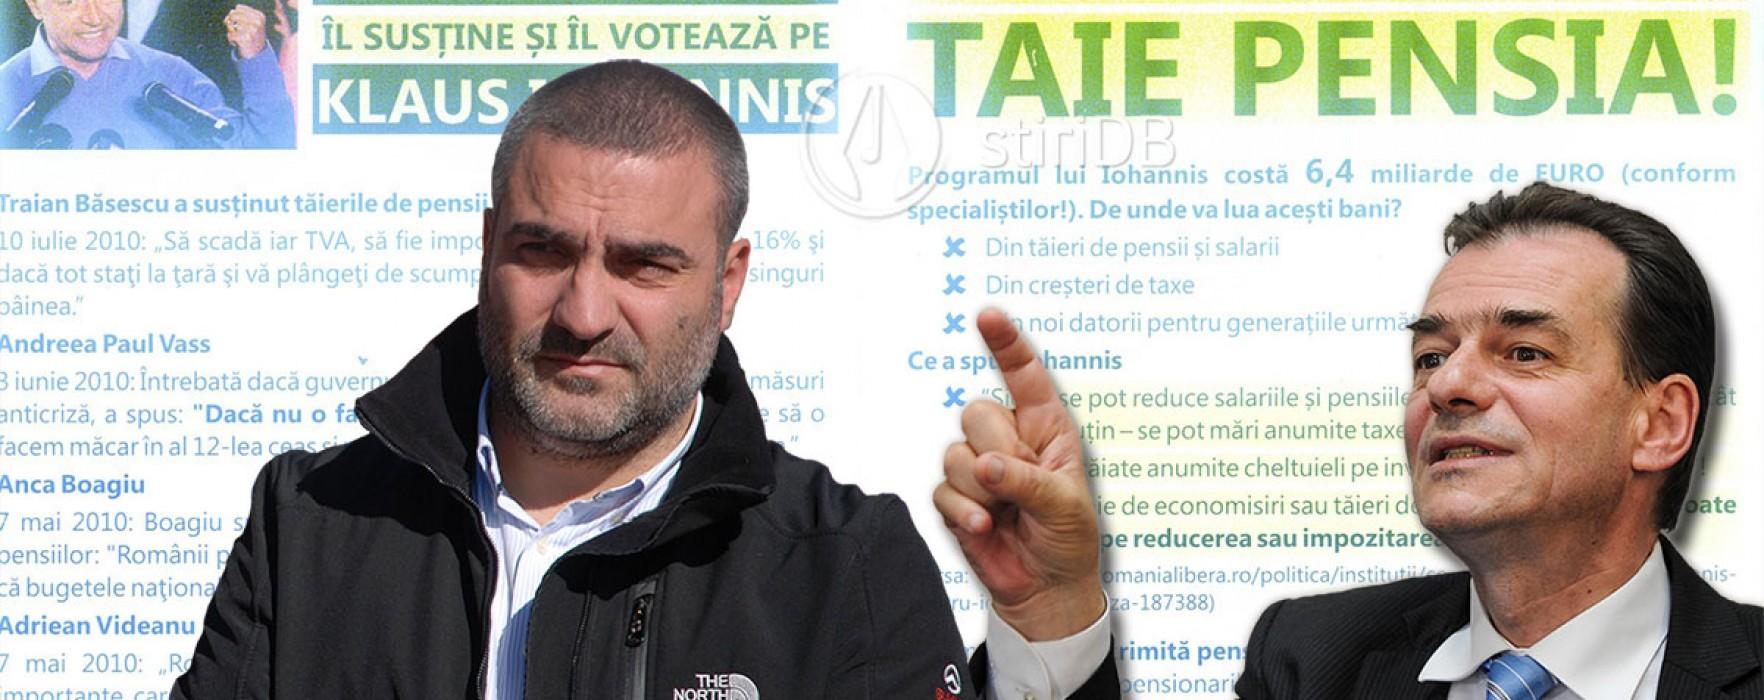 Ludovic Orban: Mihail Volintiru a tipărit pliante anti-Iohannis (audio)